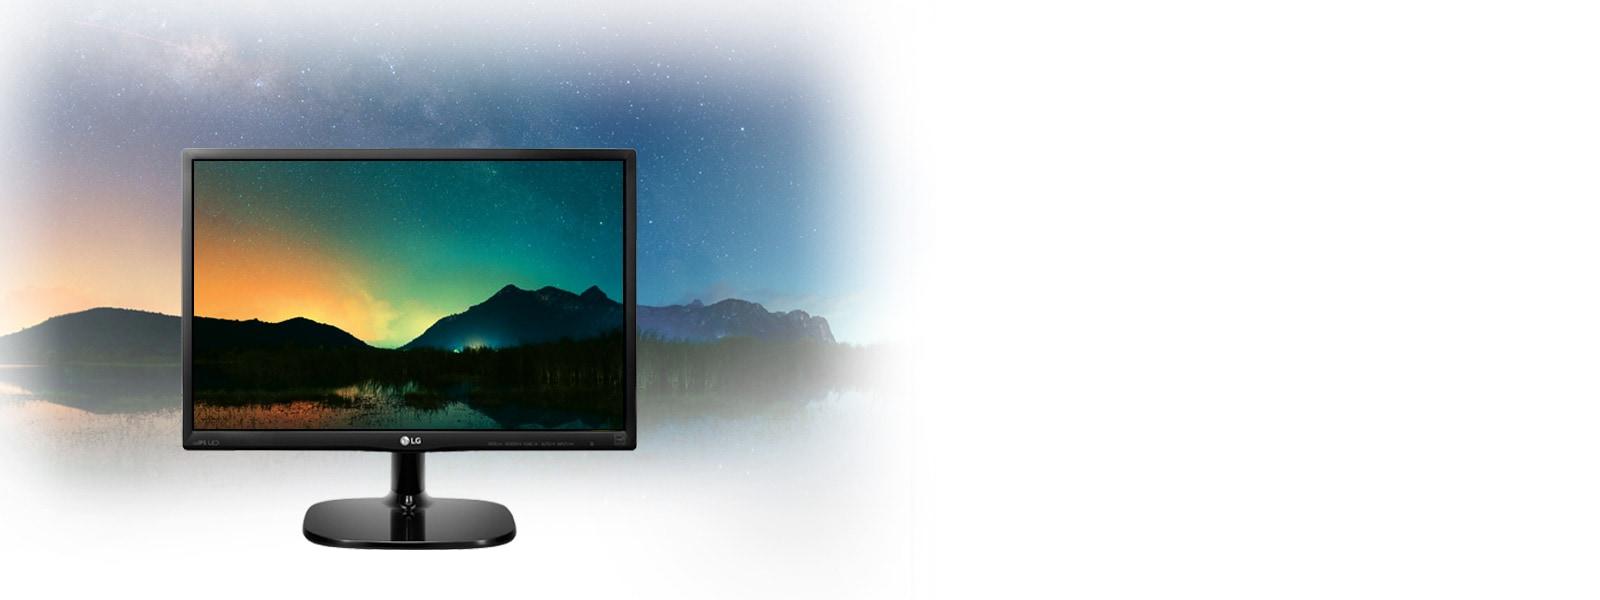 Monitor PC 21 pulgadas LED IPS Monitores LG